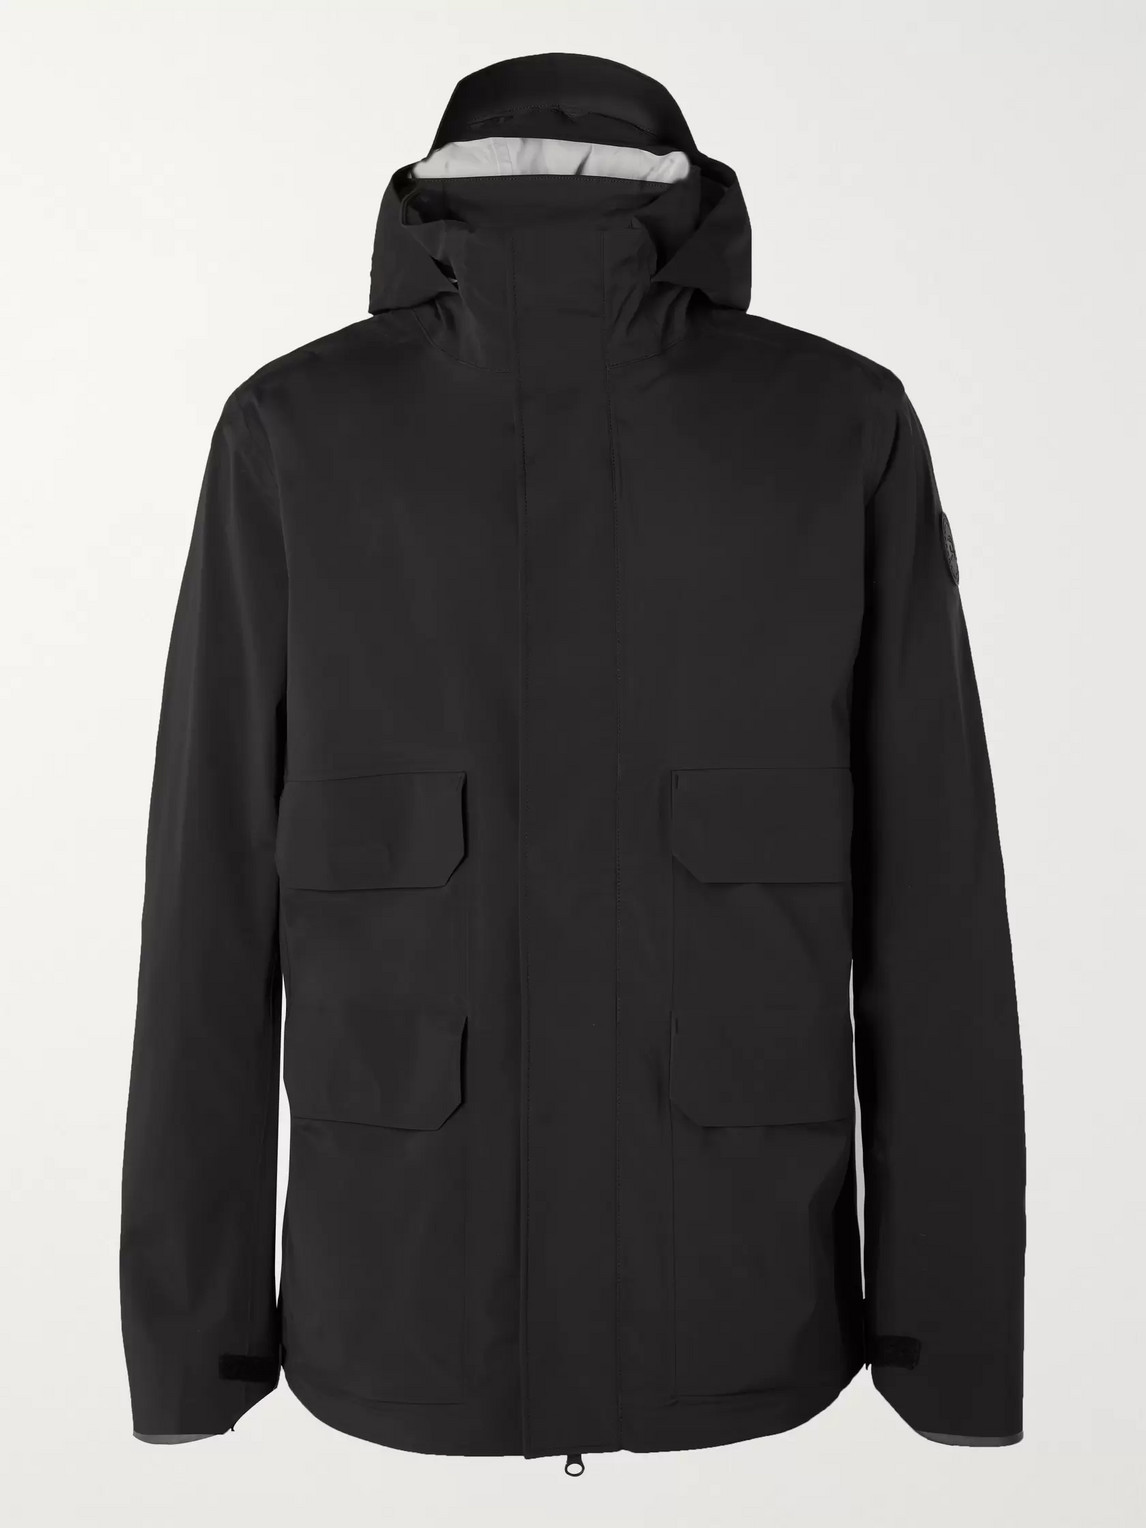 canada goose - meaford logo-print tri-durance hooded jacket - men - black